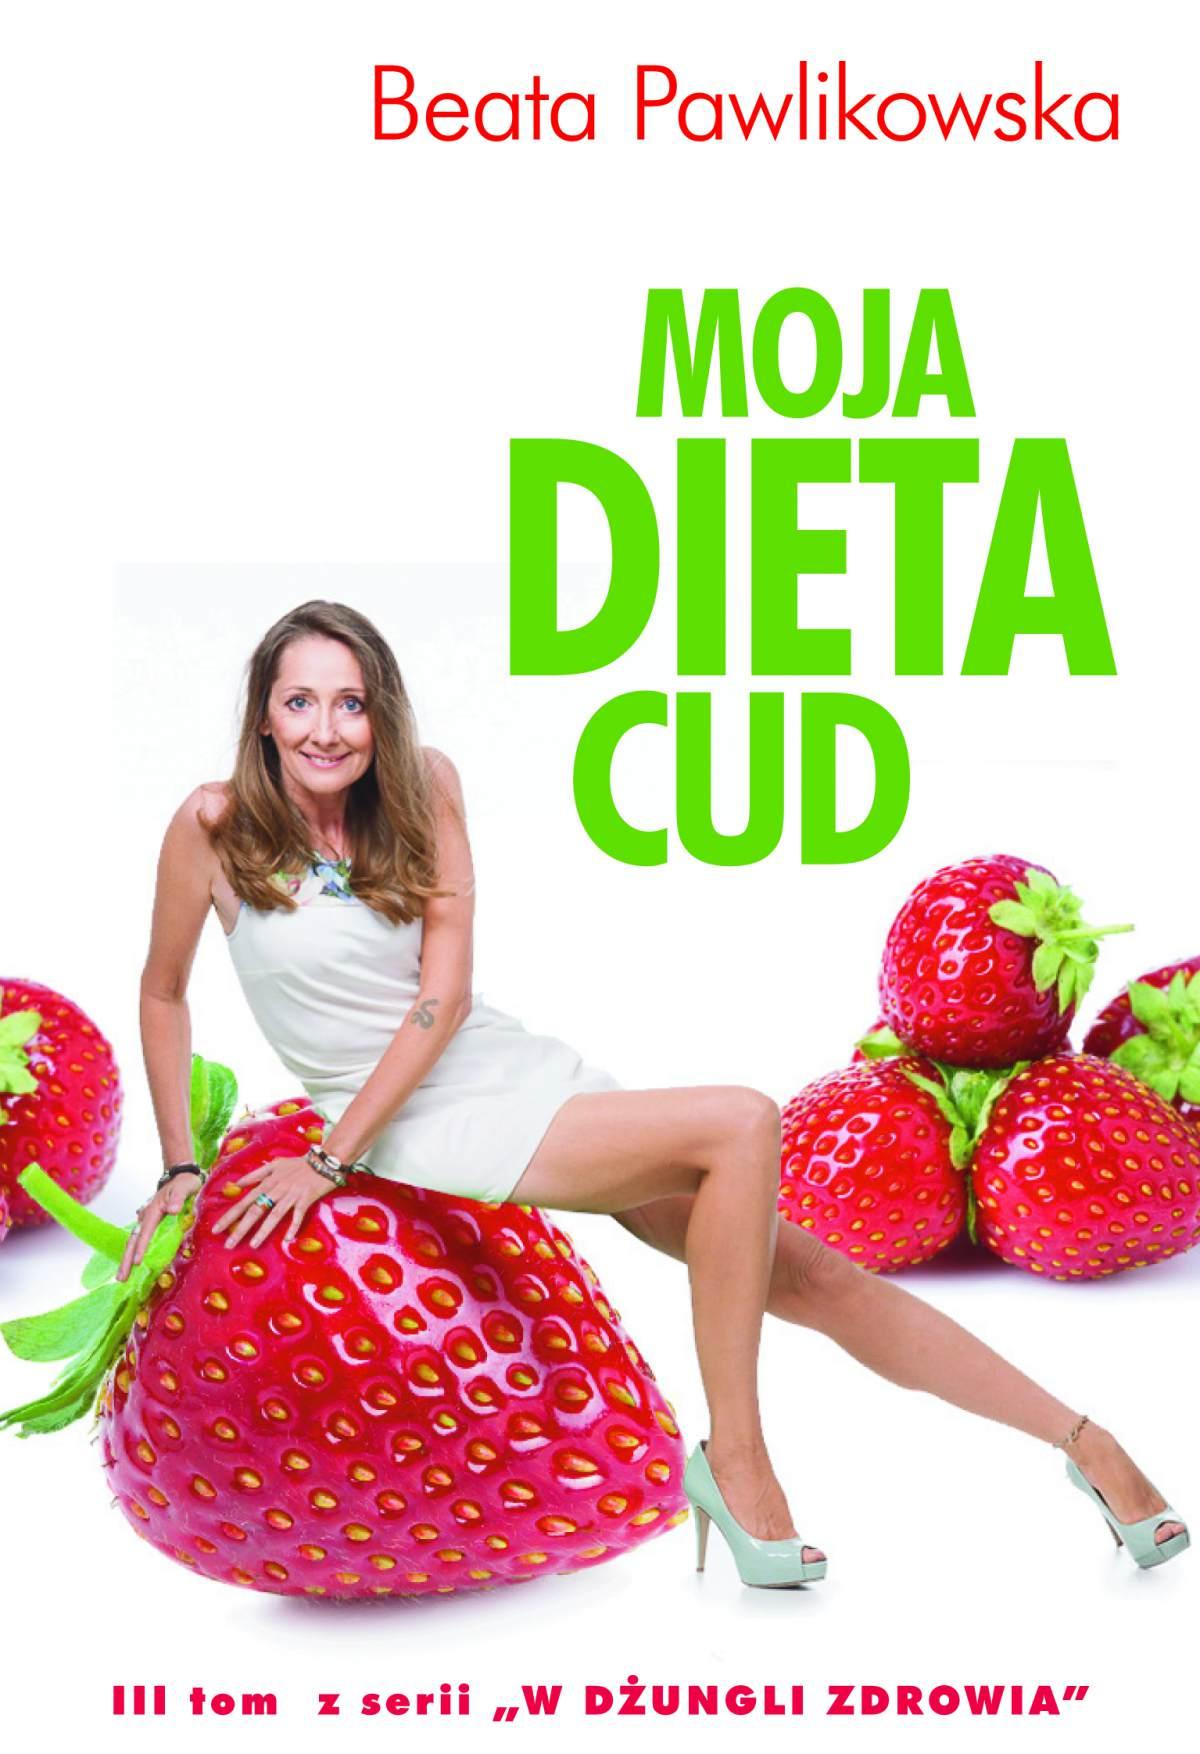 Moja dieta cud Beata Pawlikowska